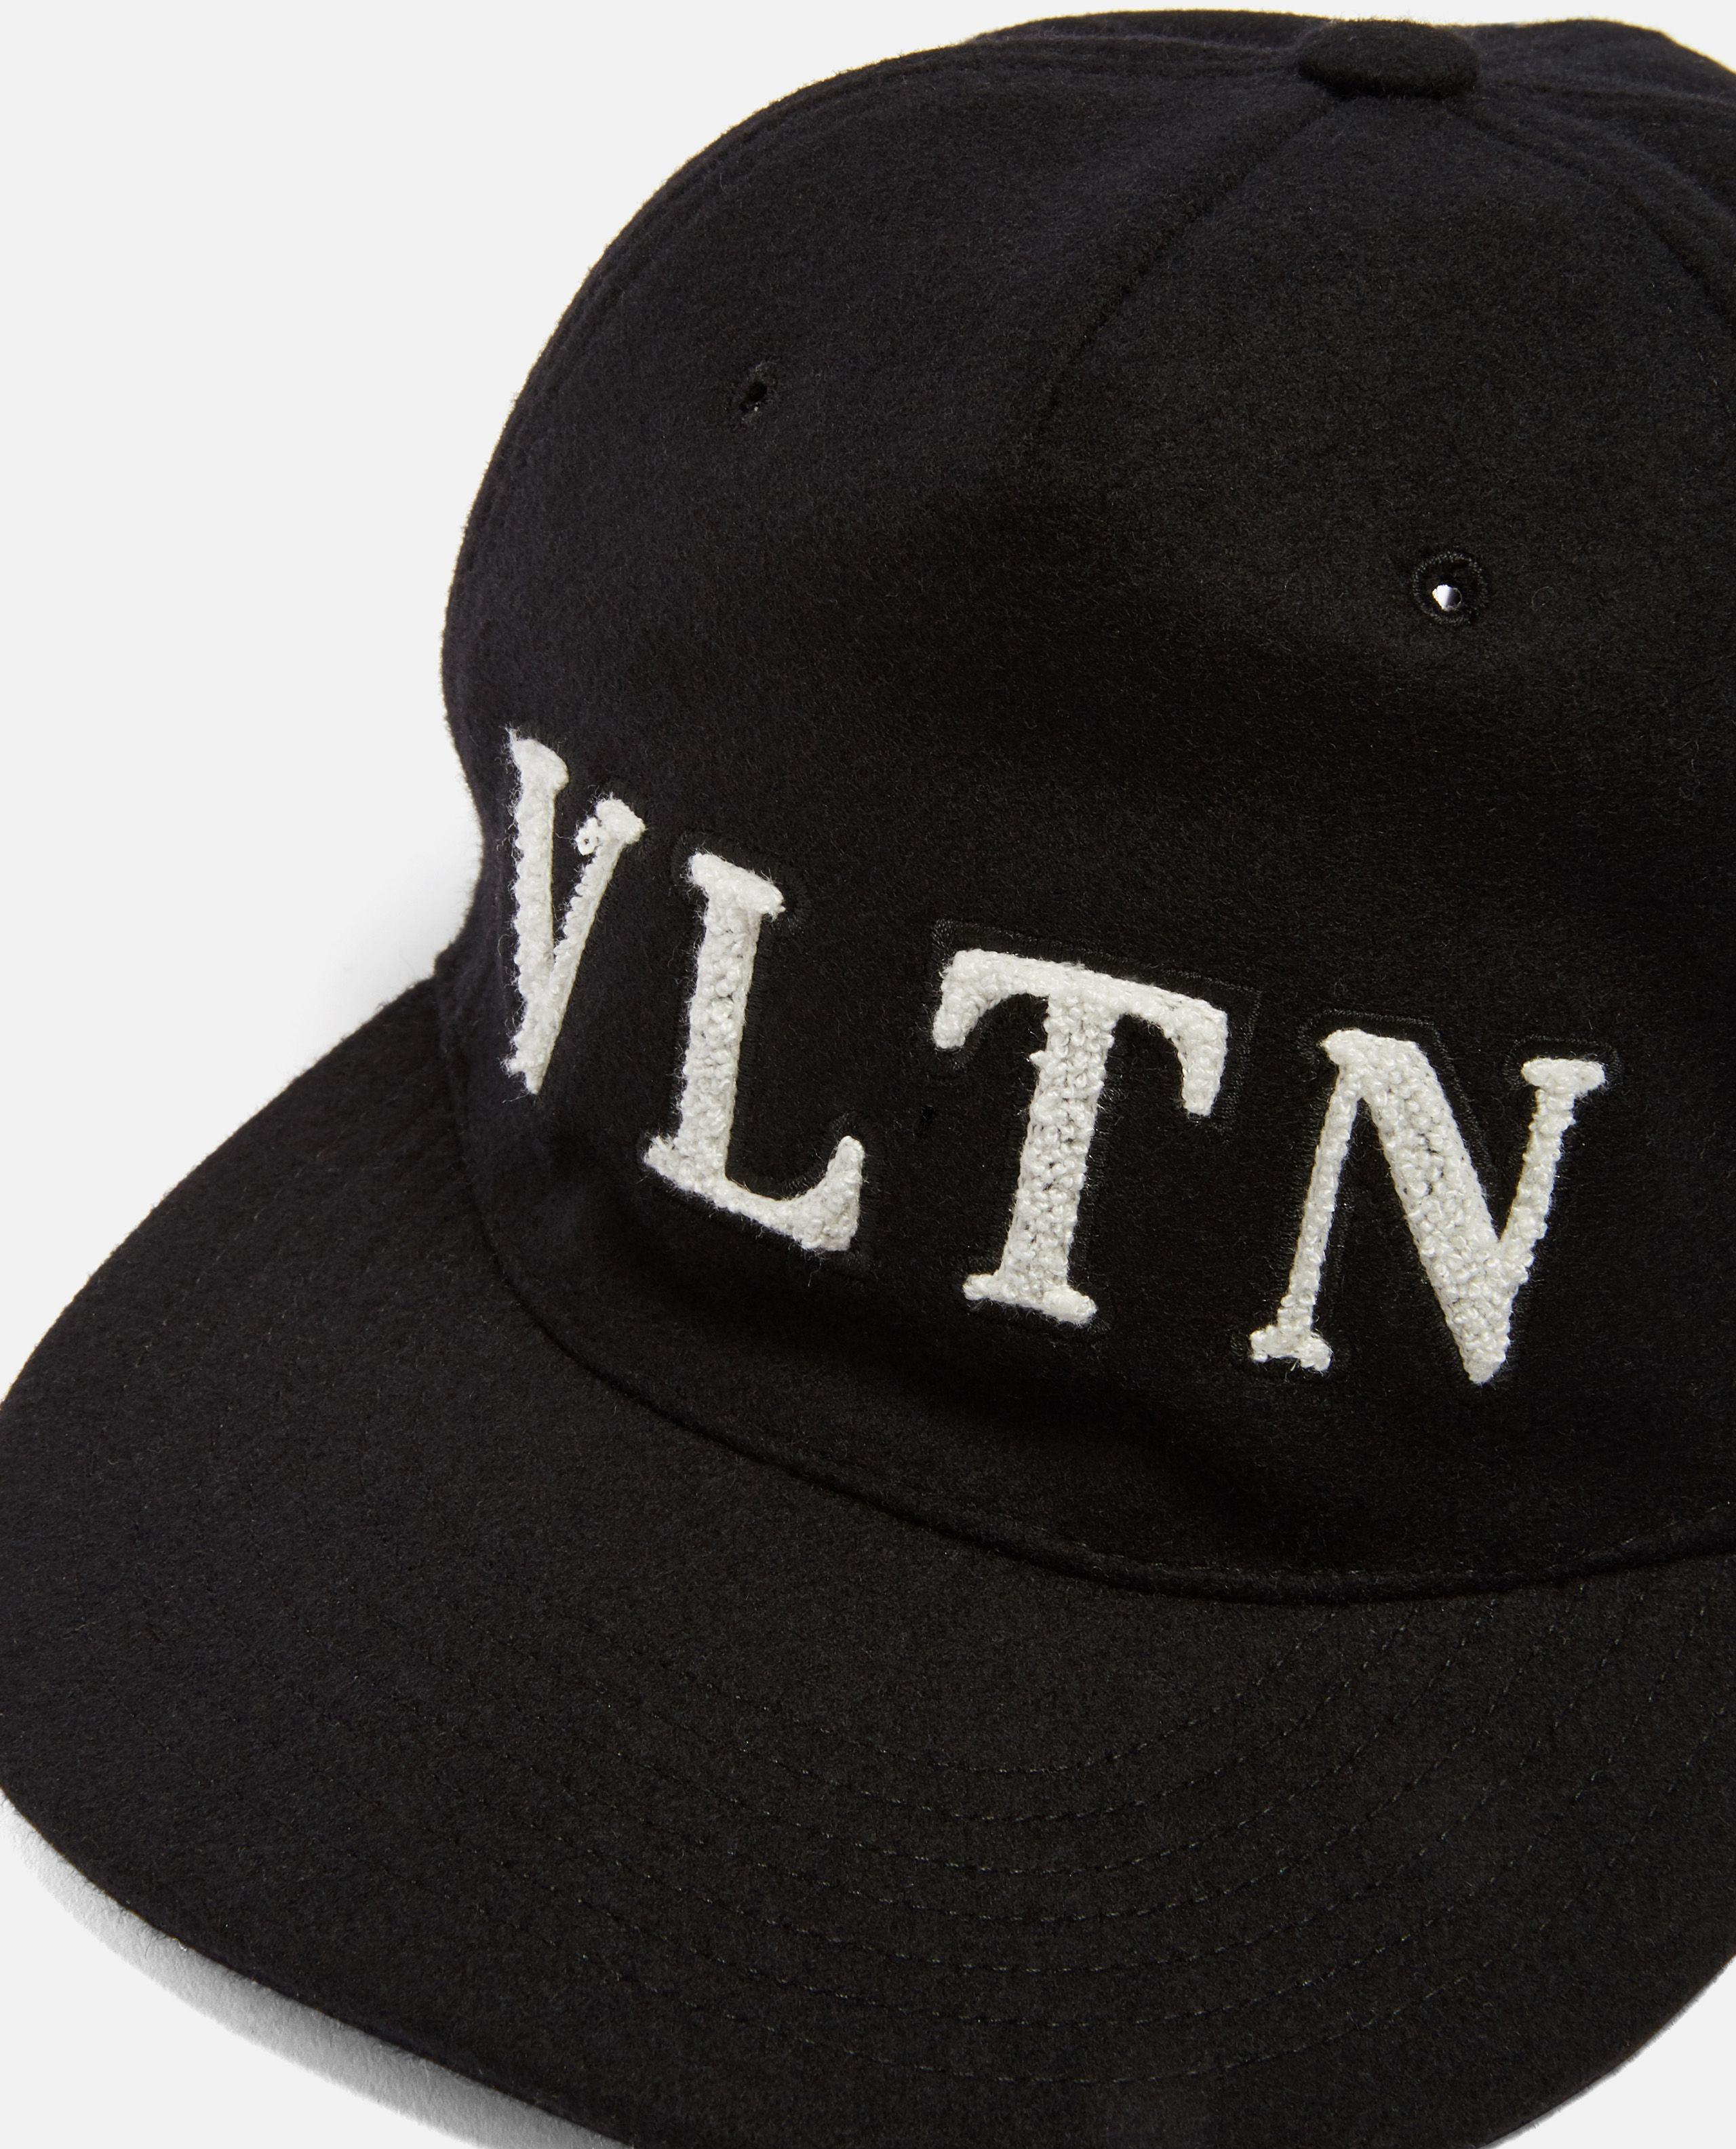 Lyst - Valentino Baseball Cap in Black for Men - Save 9.420289855072468% 28cc562068bf